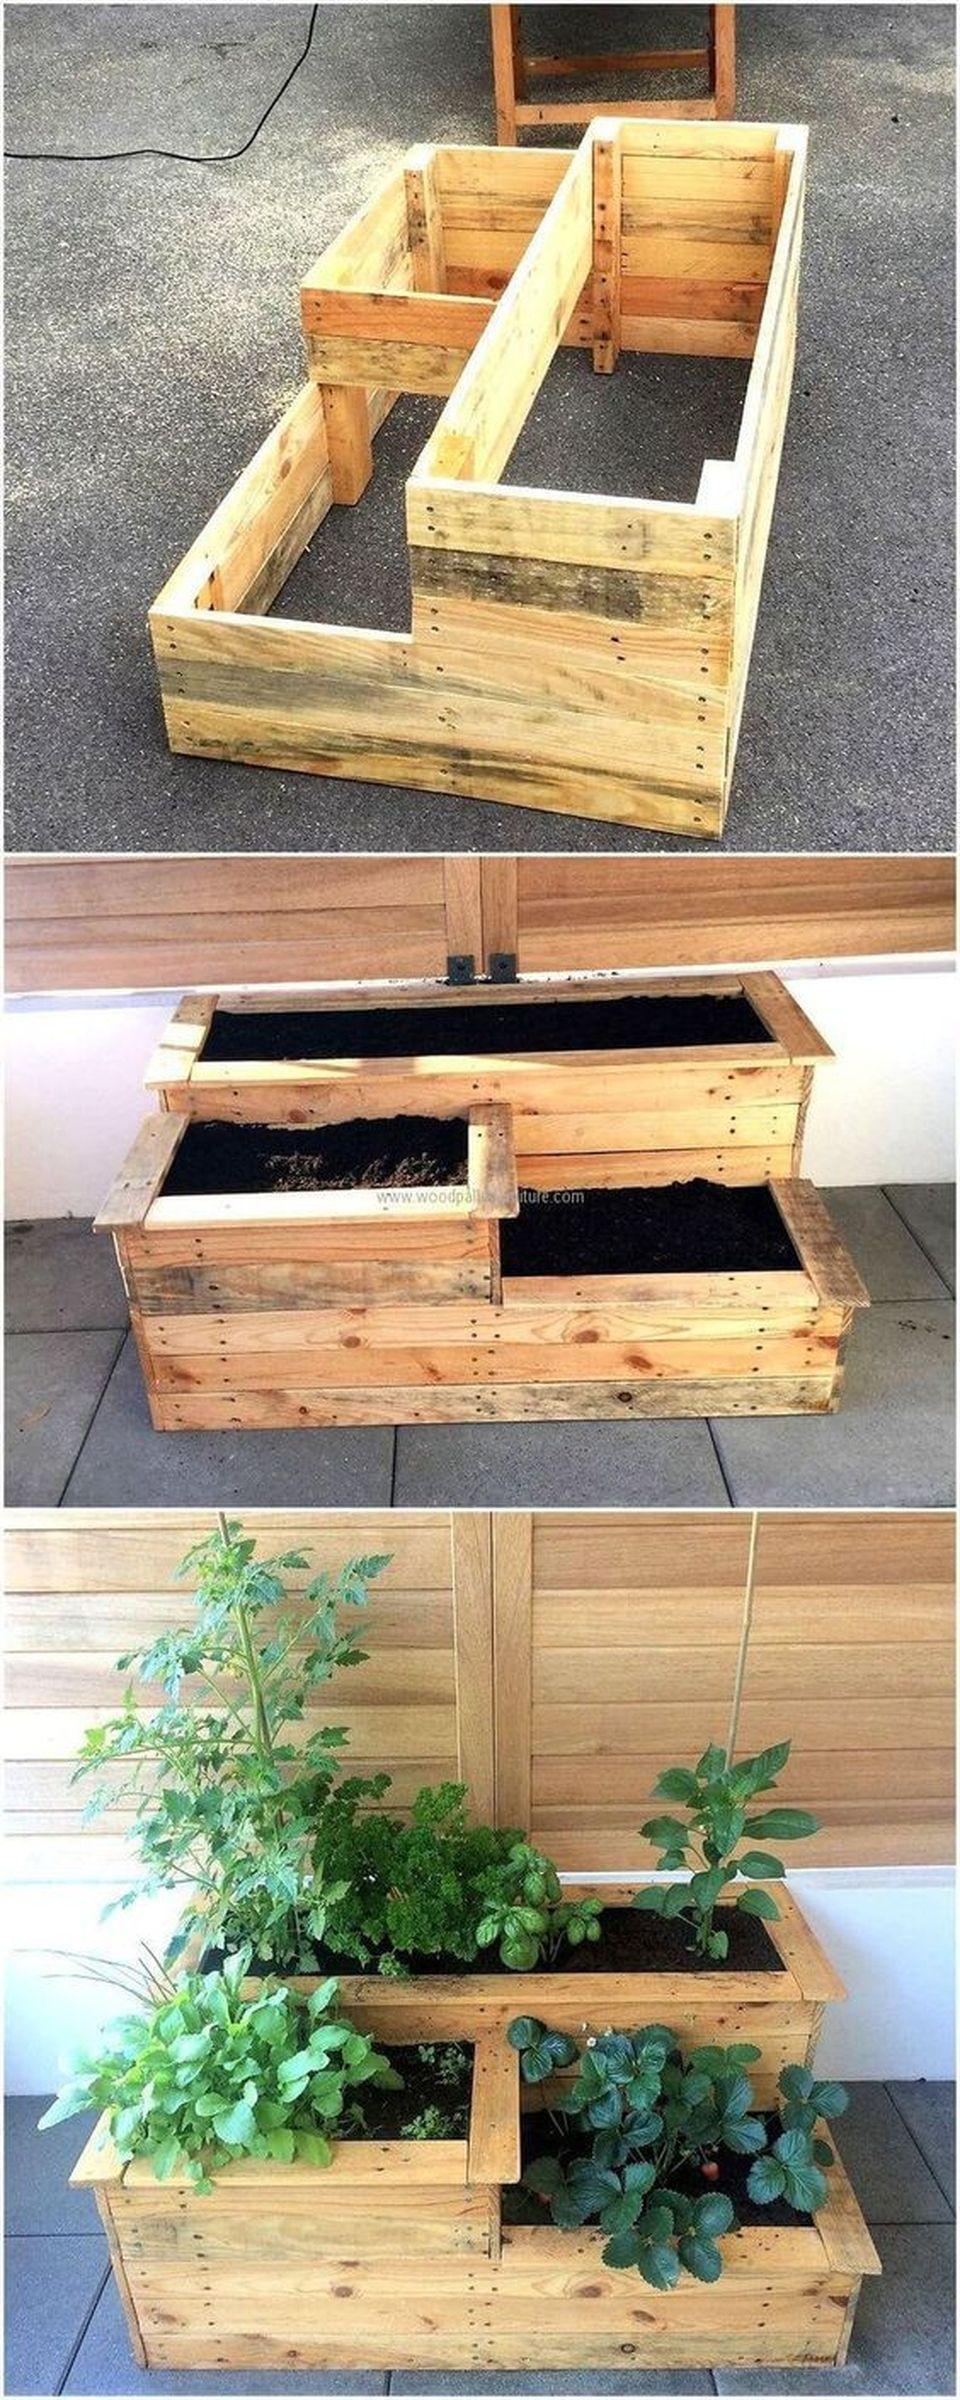 Amazing Creative Wood Pallet Garden Project Ideas